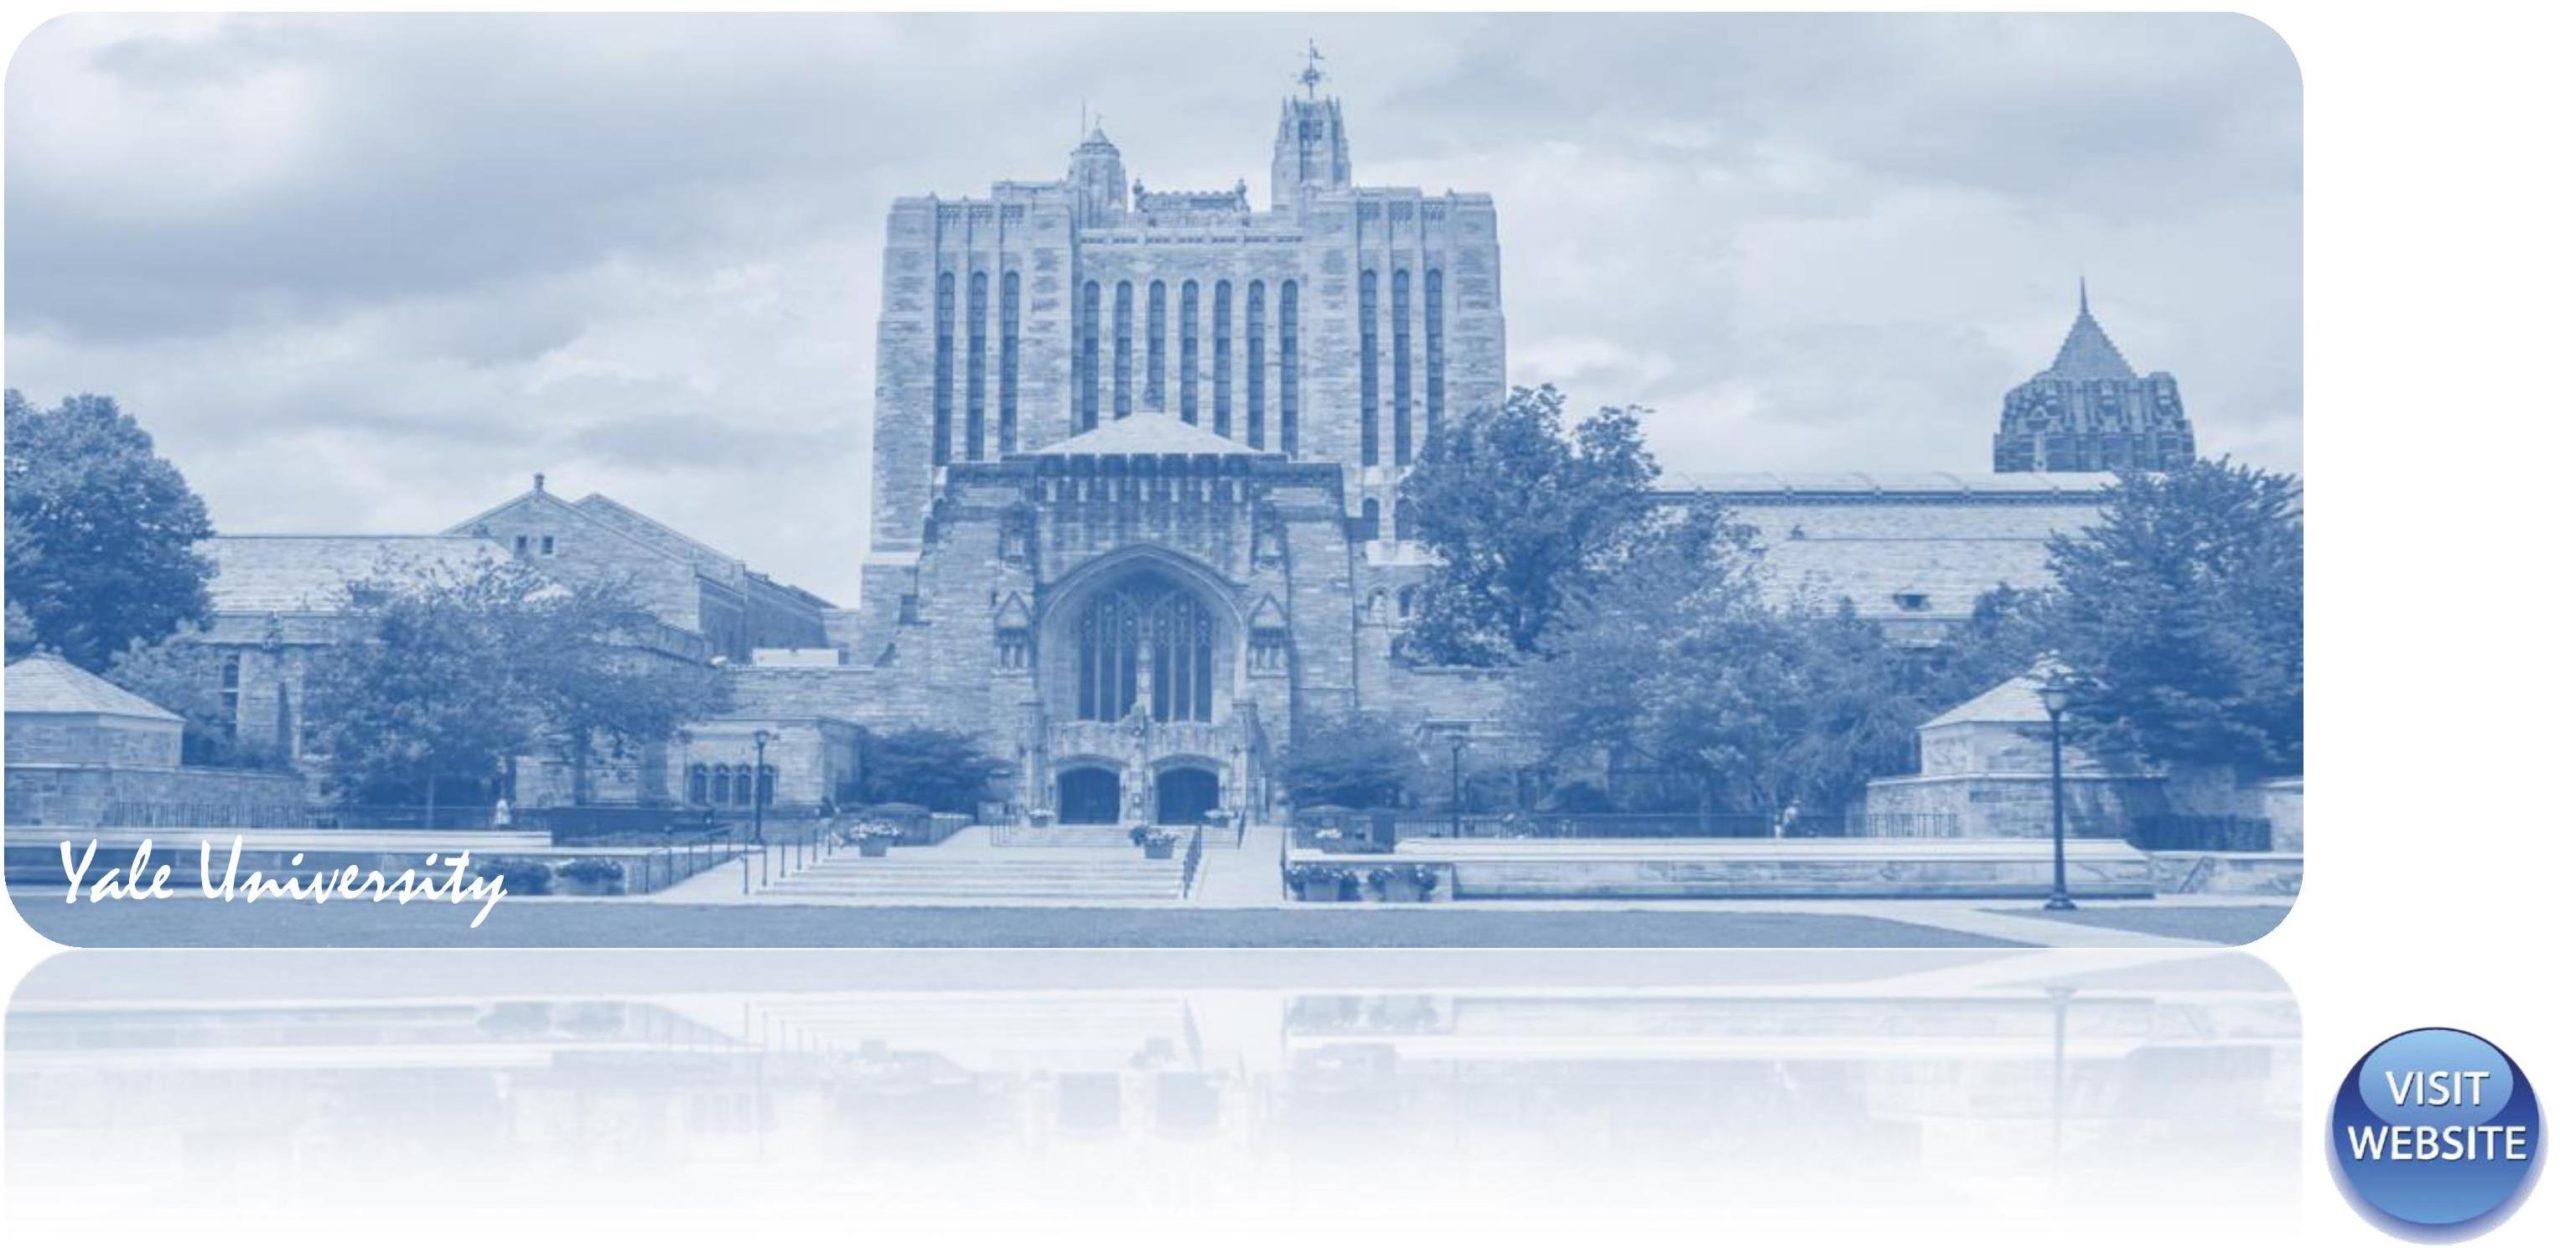 Yale University USA